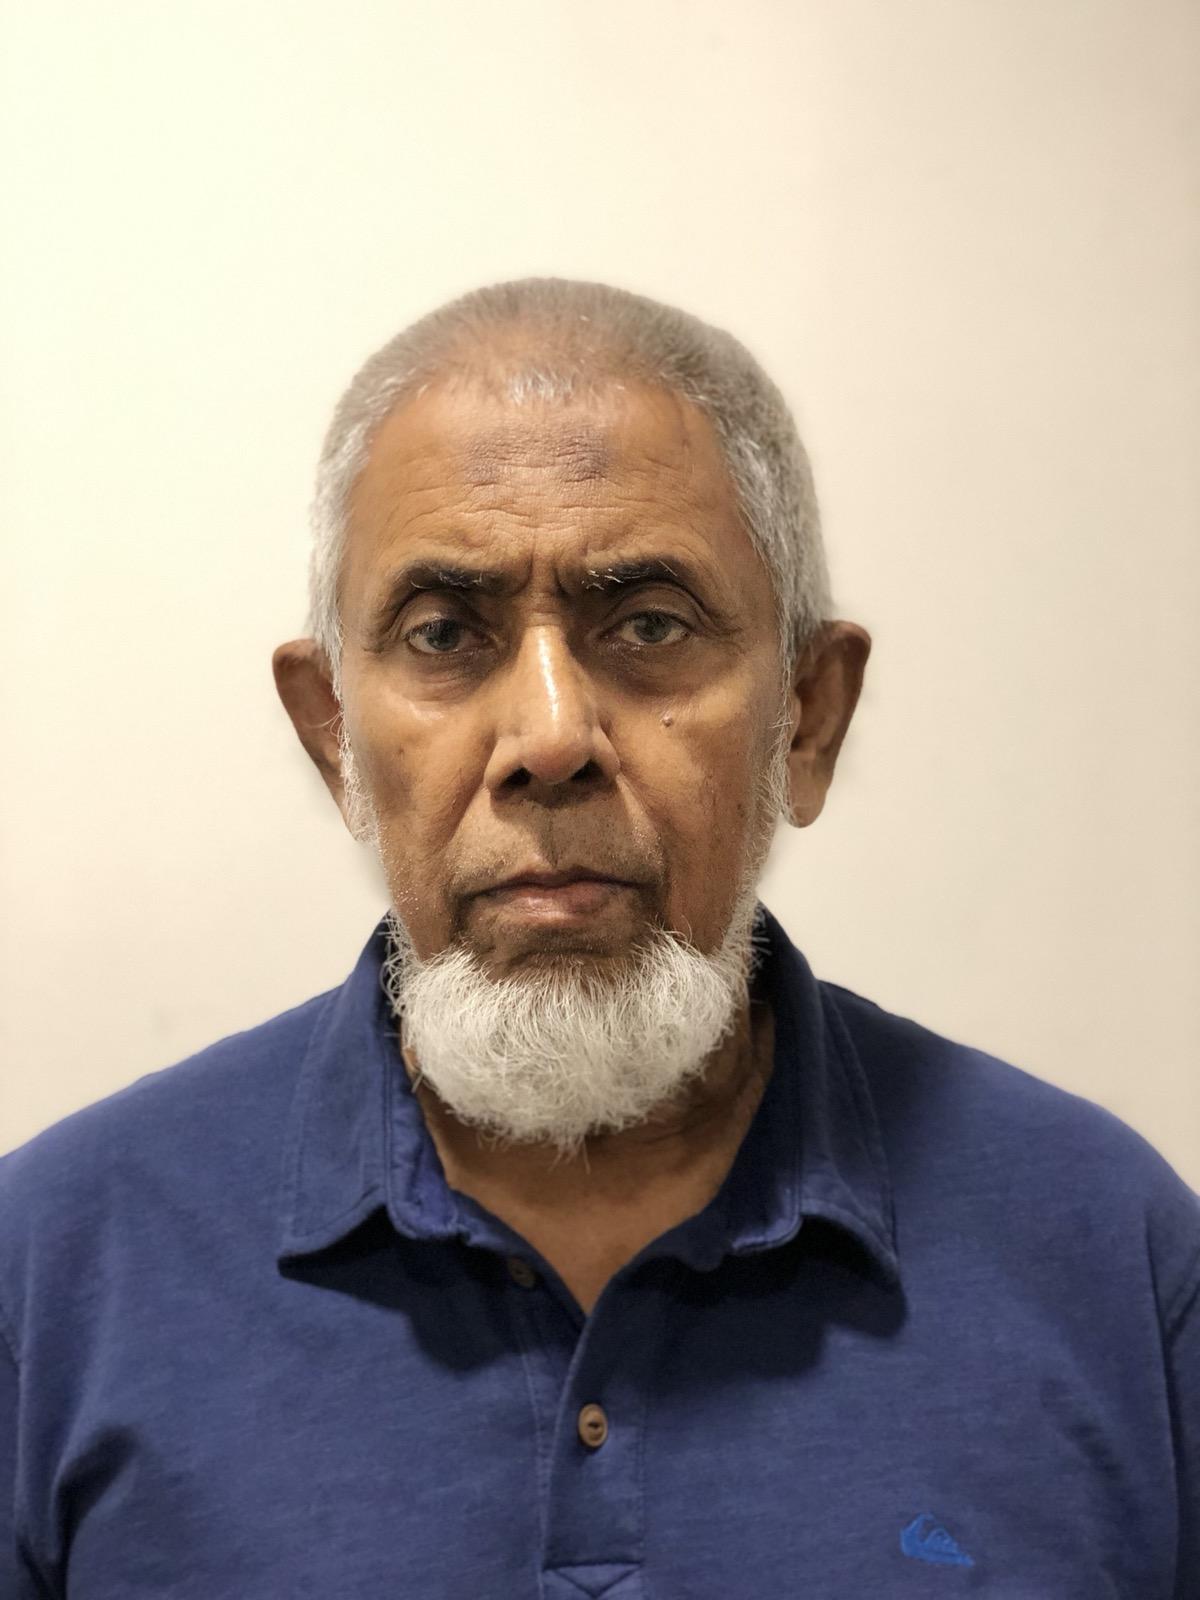 Hura Abdul Sattar